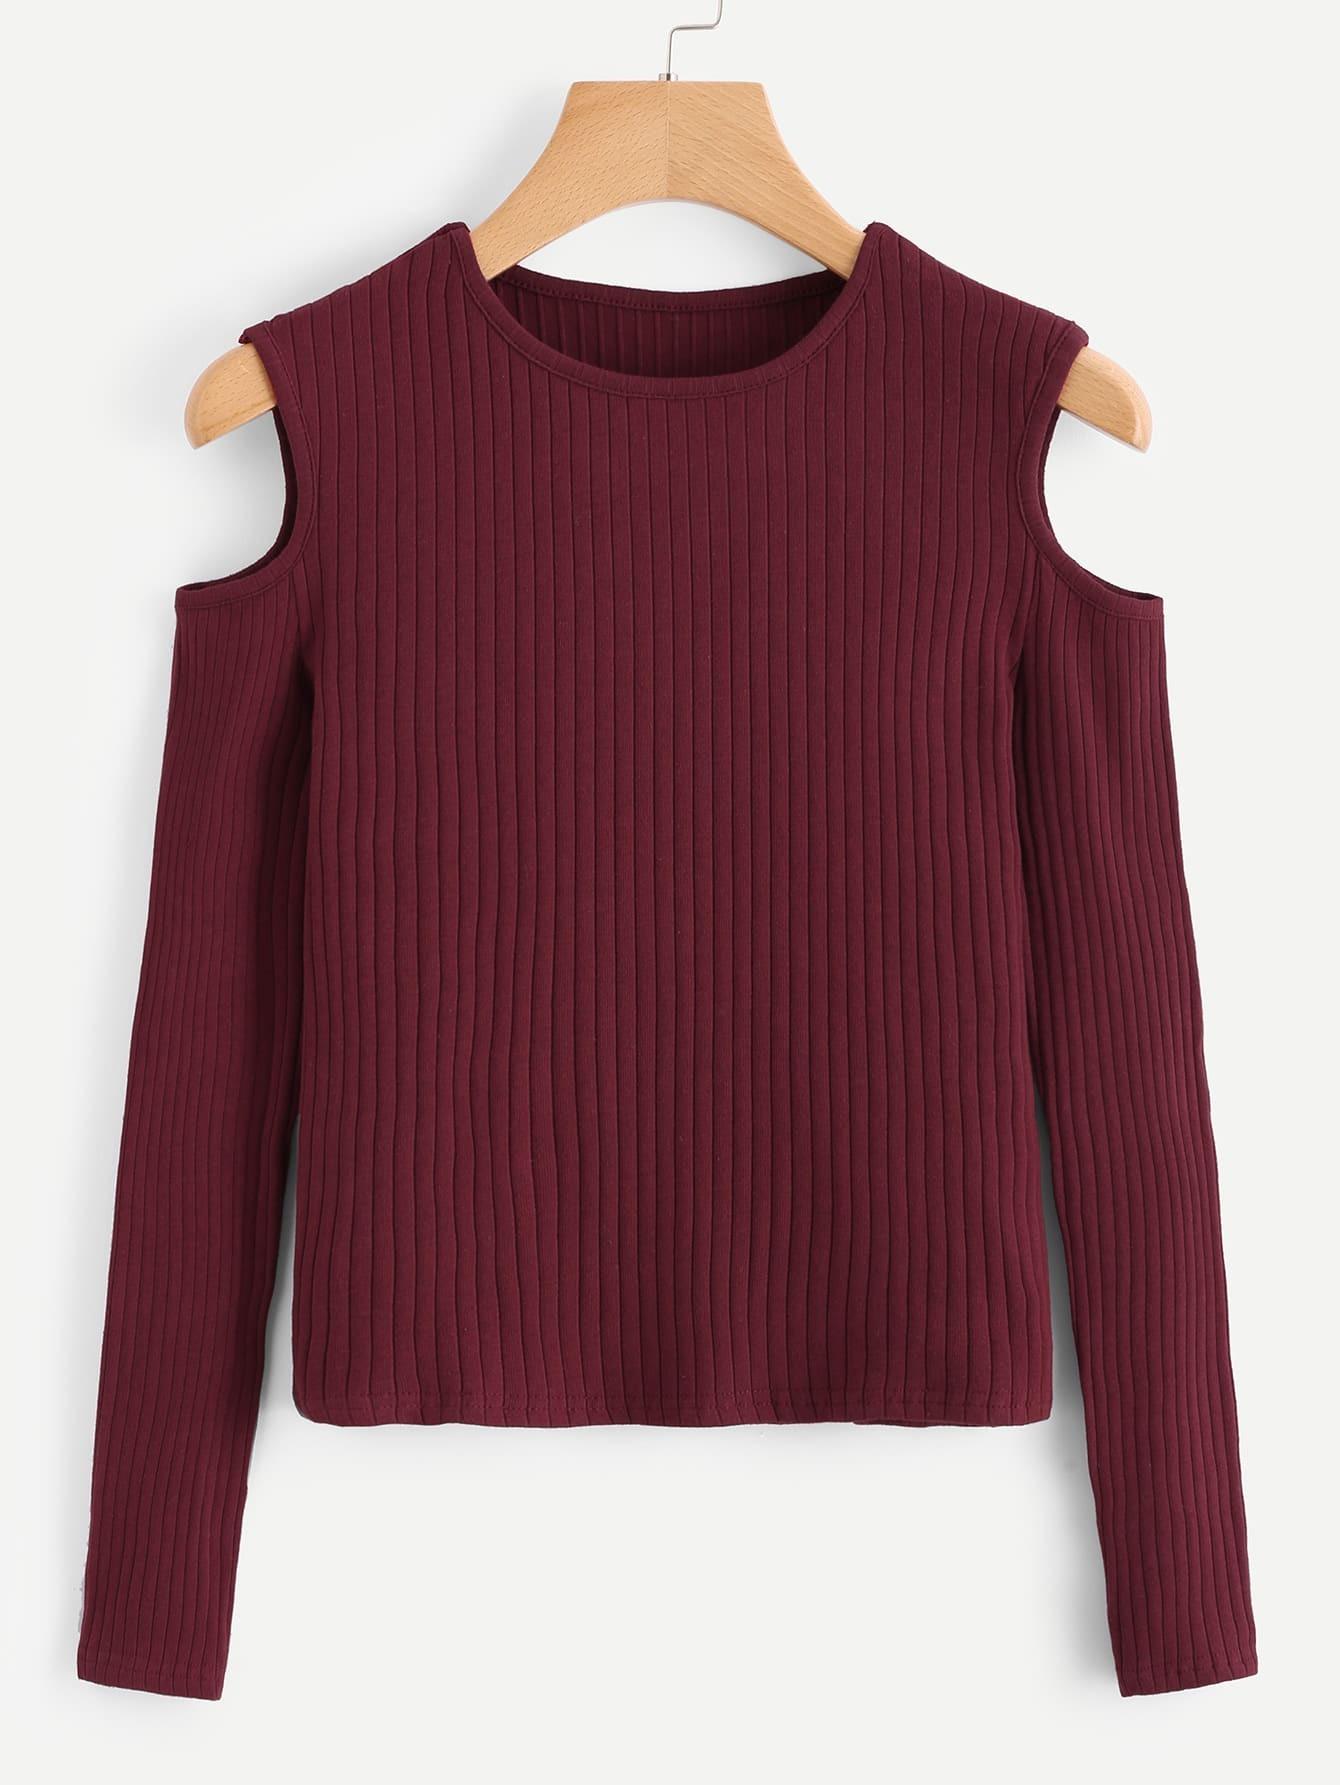 Open Shoulder Ribbed Tshirt tee180105115